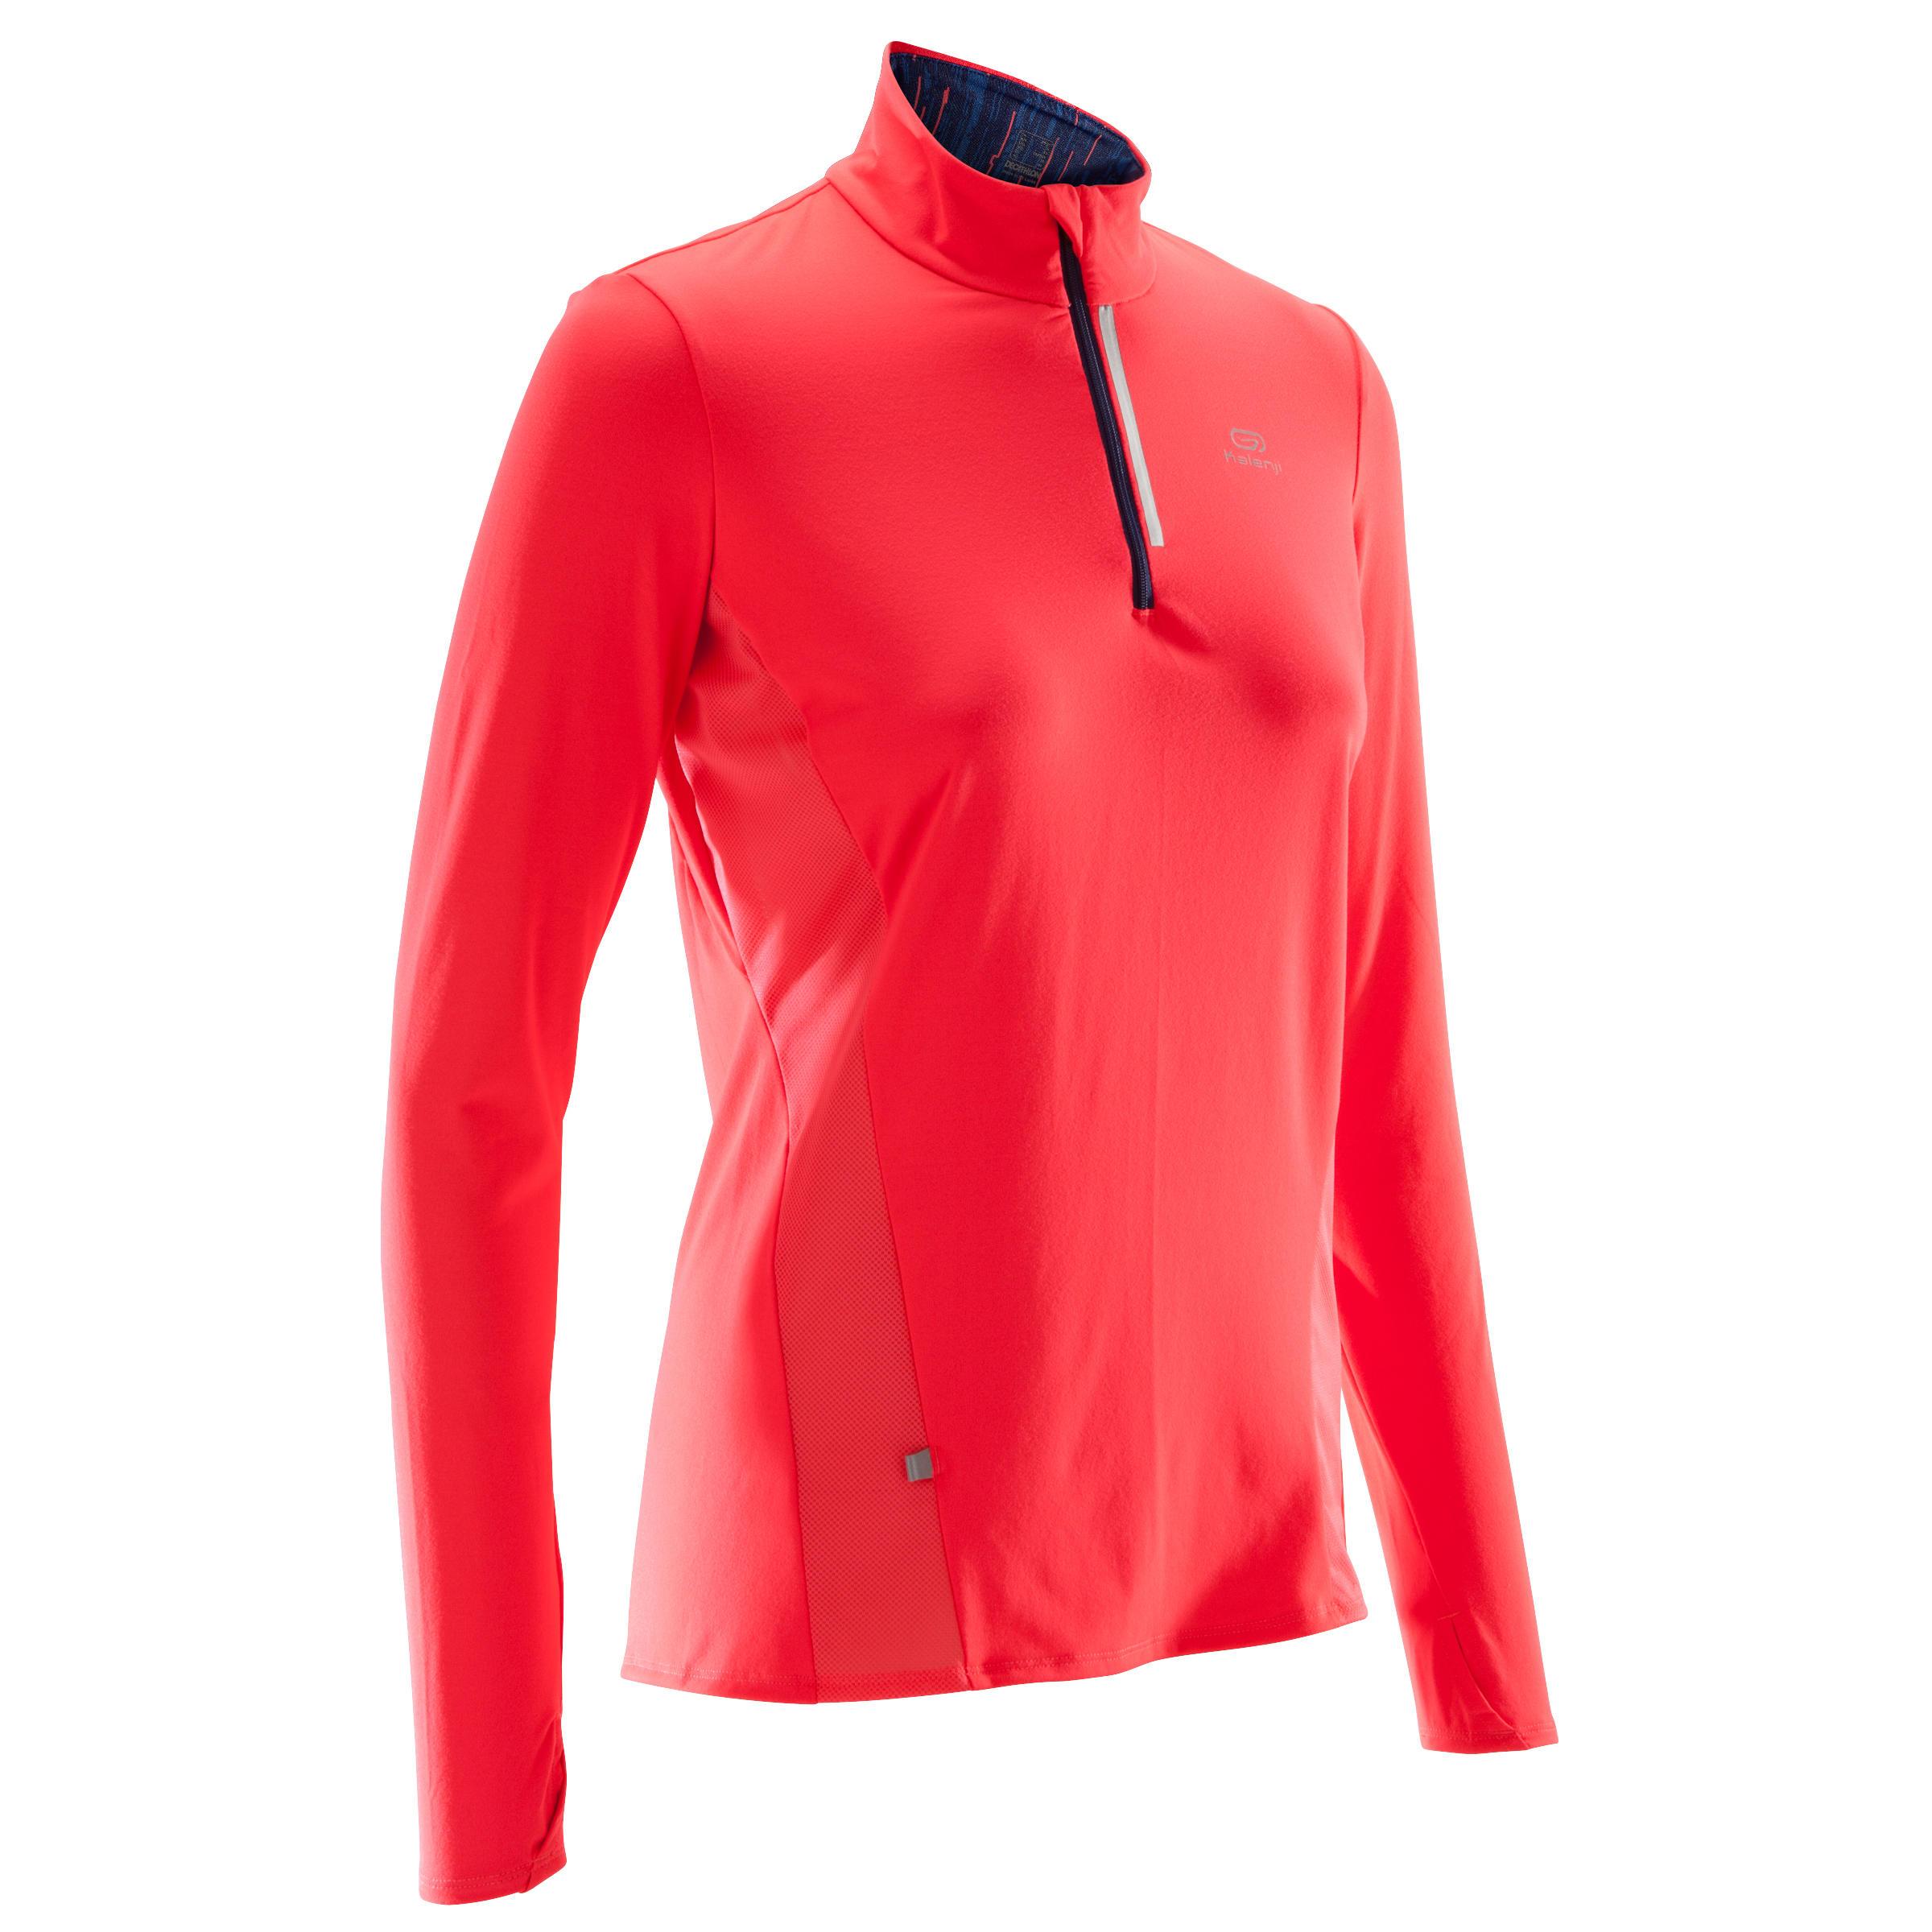 Kalenji Loopshirt Run Dry+ met lange mouwen en rits voor dames